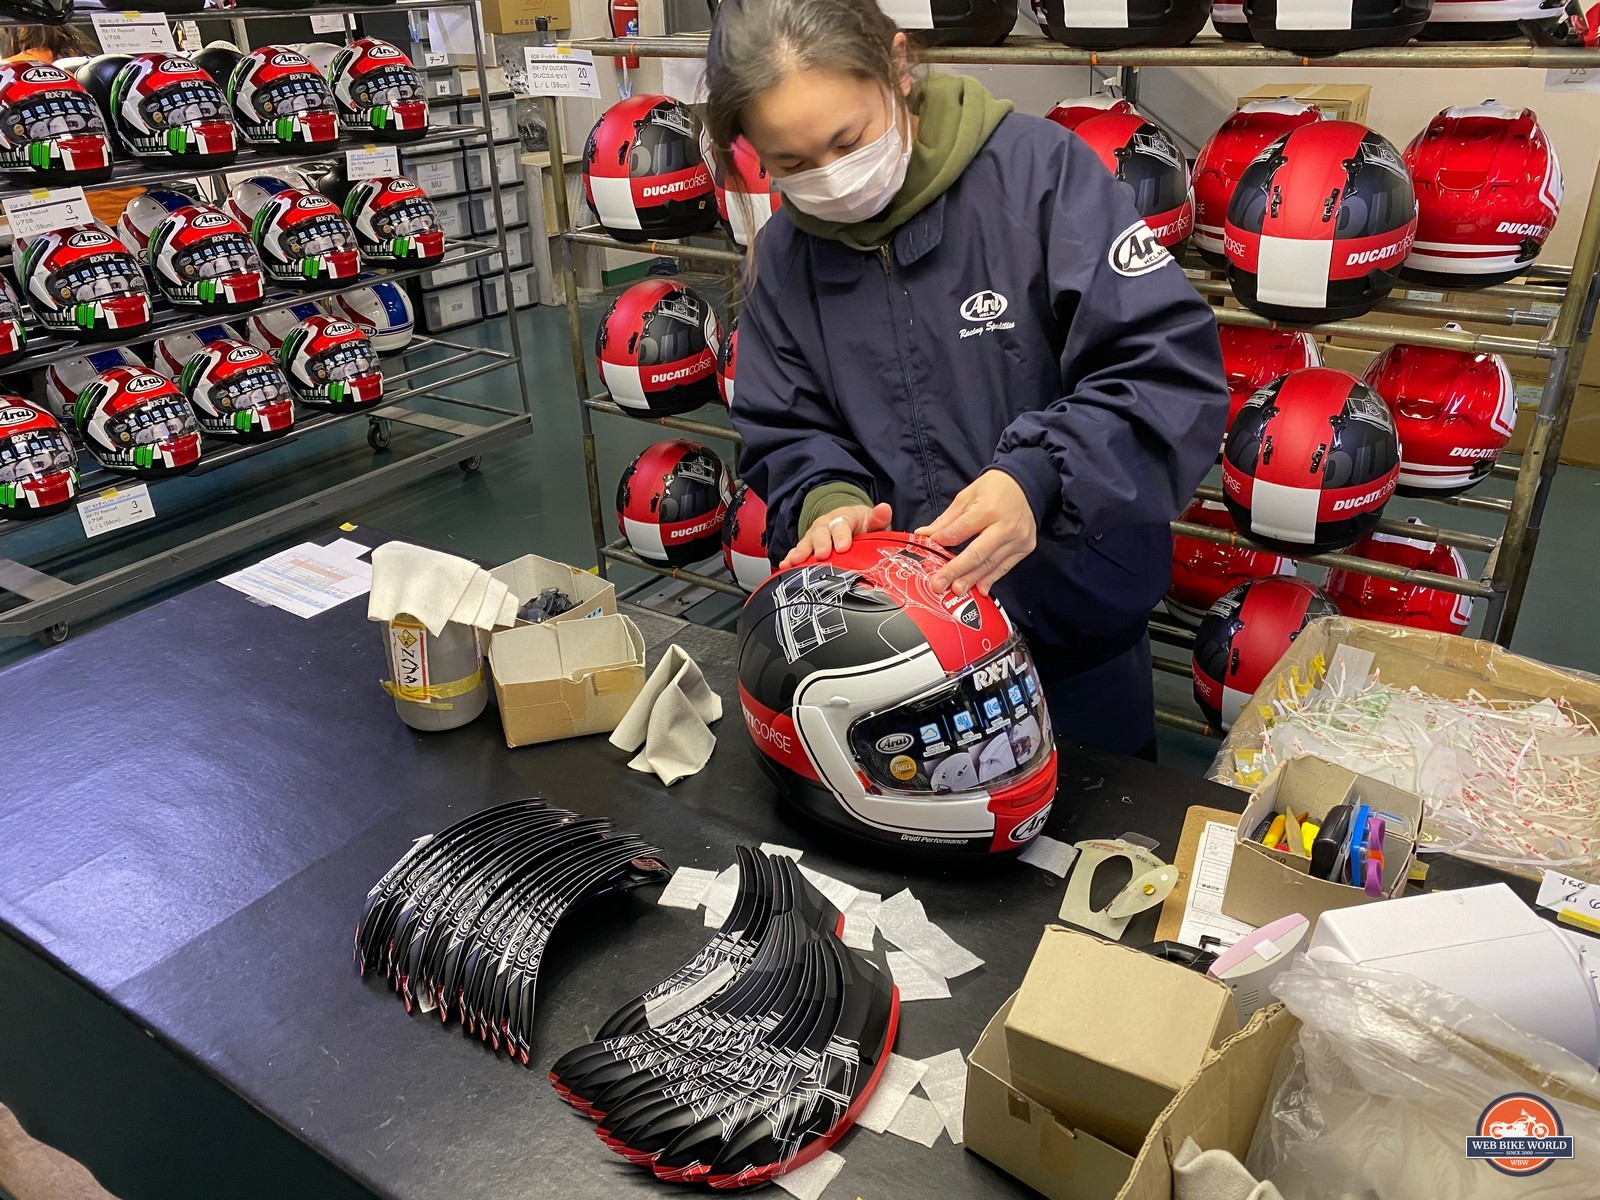 Installing diffusers on an Arai helmet.